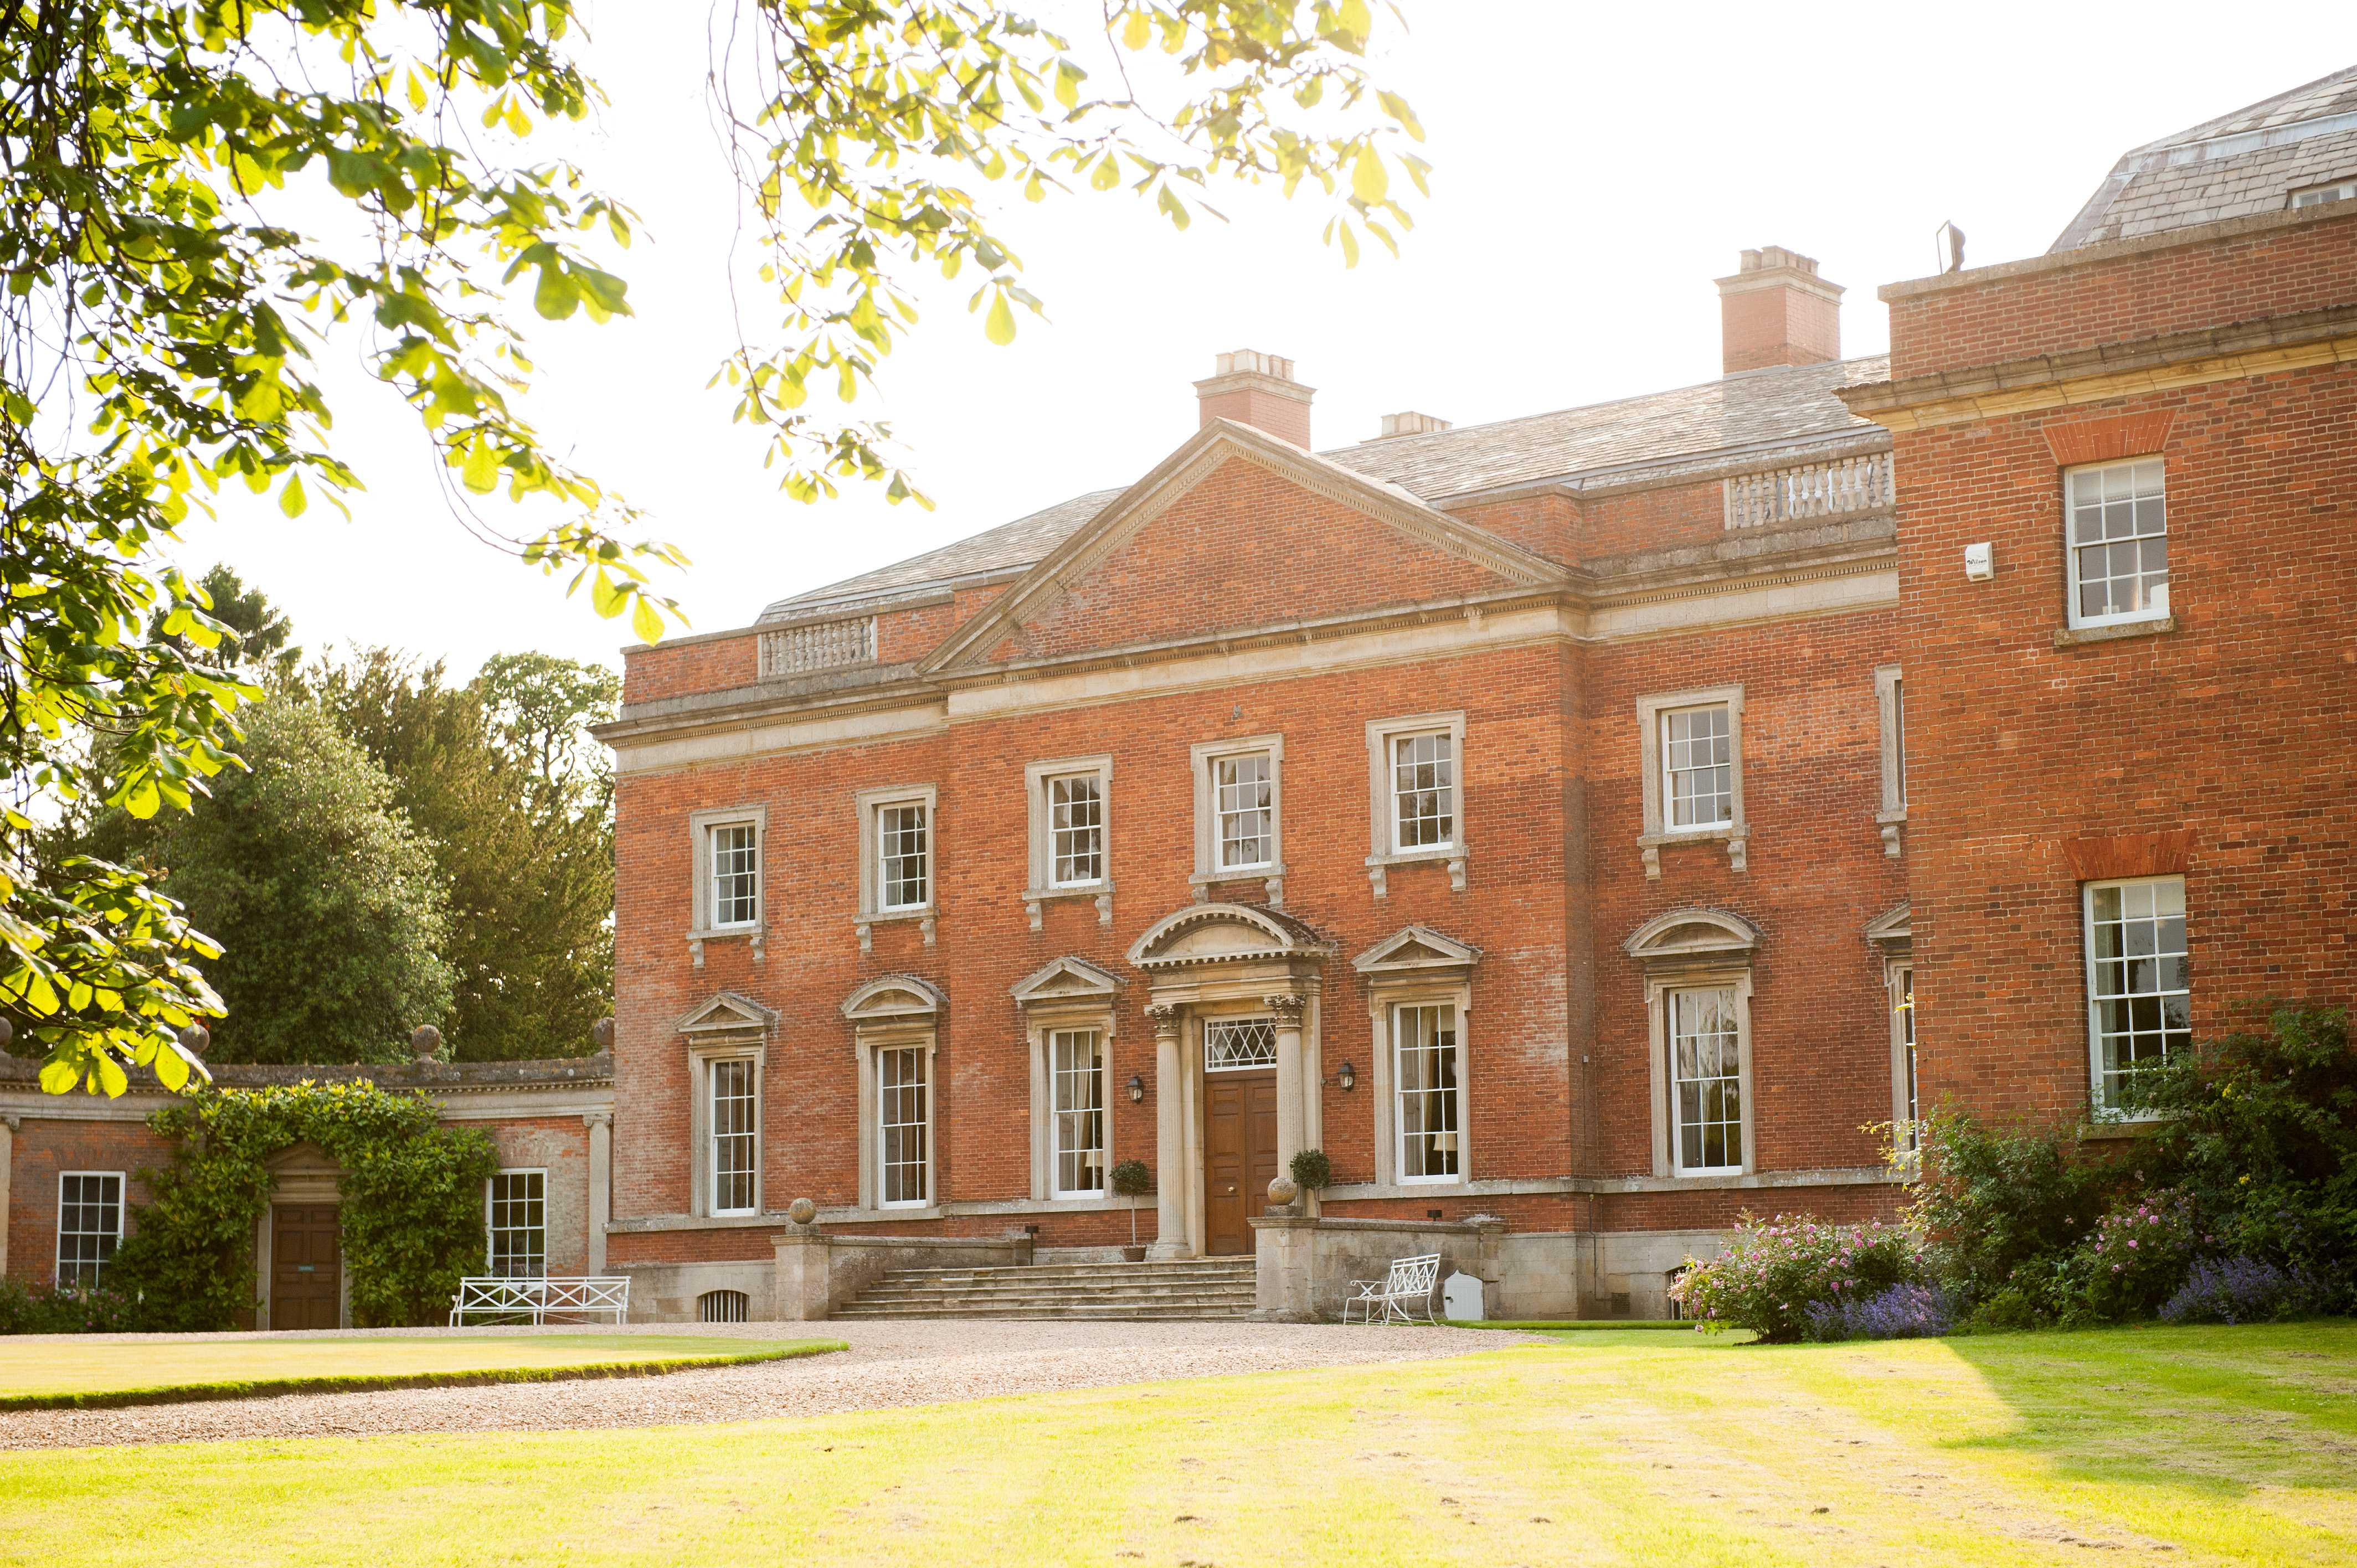 Kelmarsh Hall, Northamptonshire, England